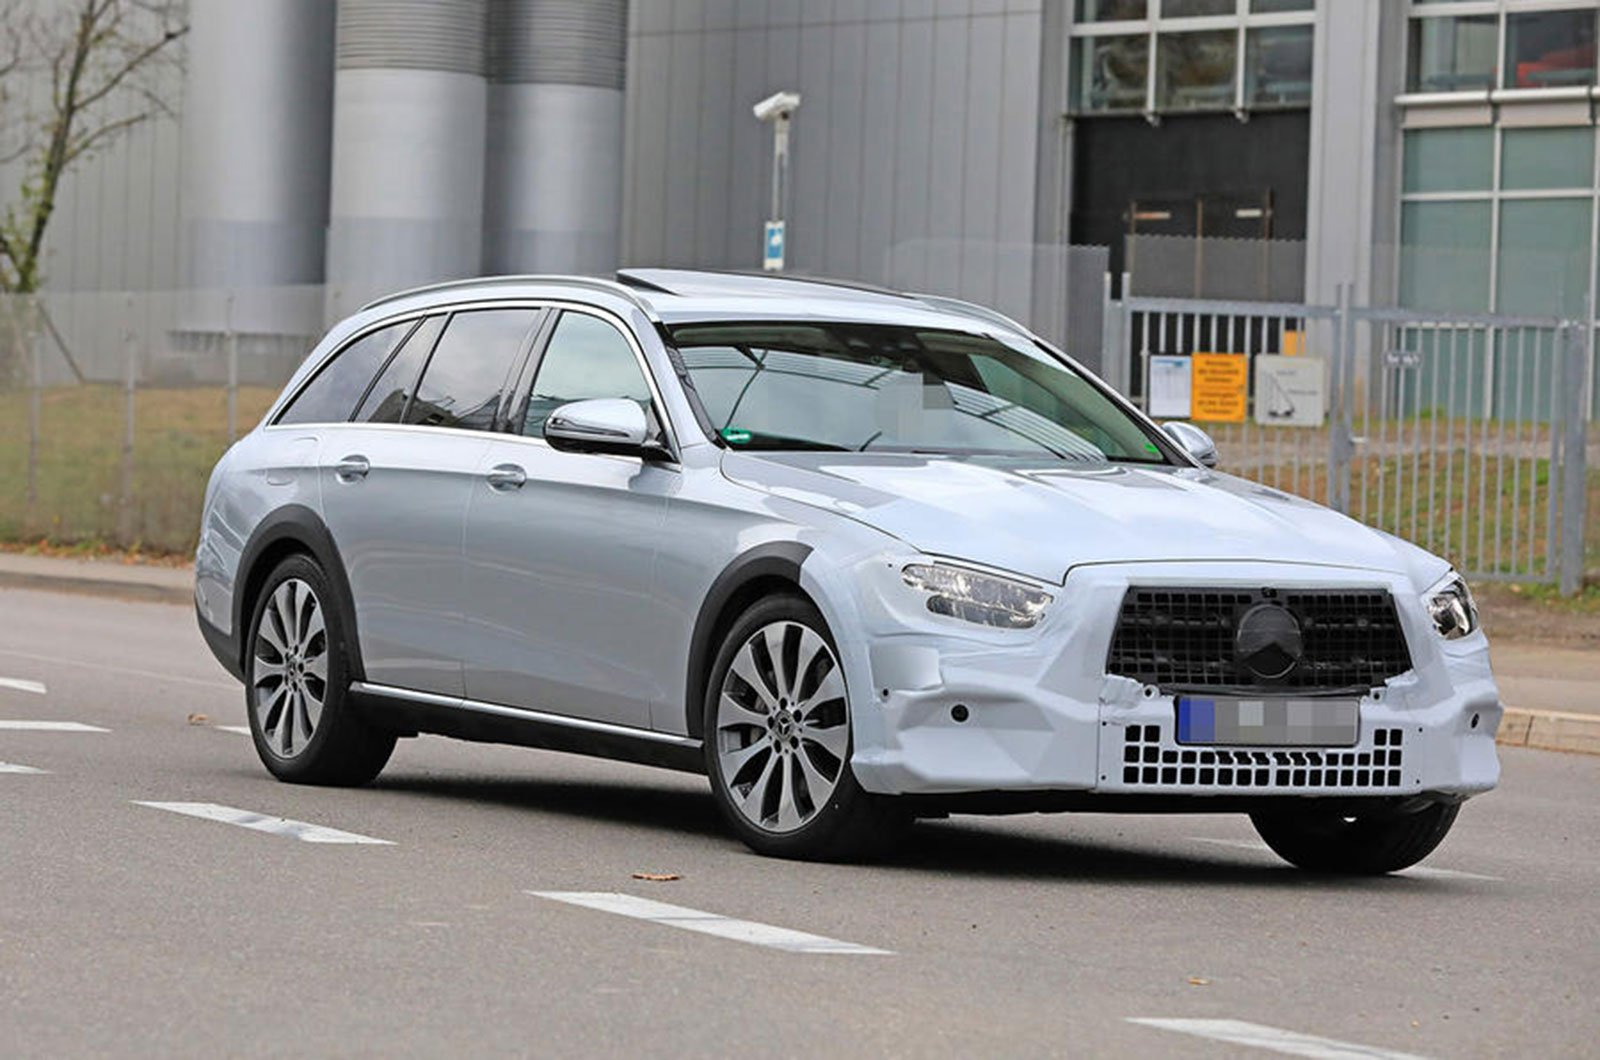 New Mercedes E-Class spyshot